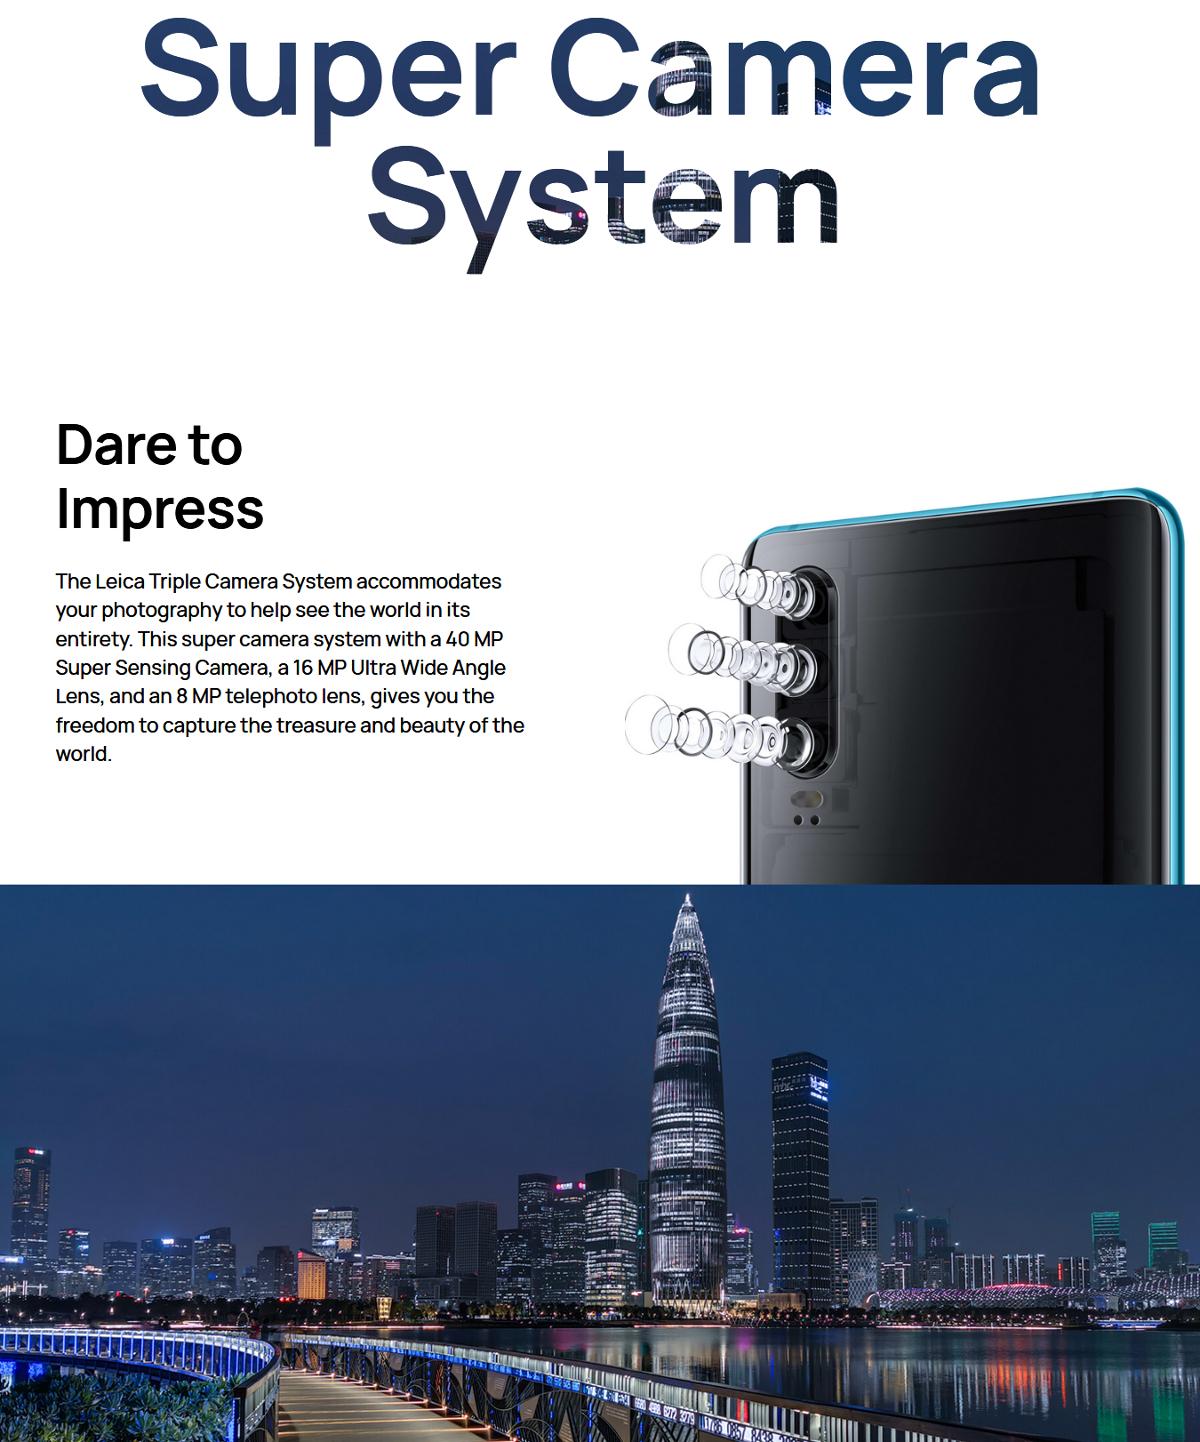 HUAWEI P30 6.1 inch Triple Rear Camera 8GB RAM 64GB/128GB ROM Kirin 980 Octa core 4G Smartphone